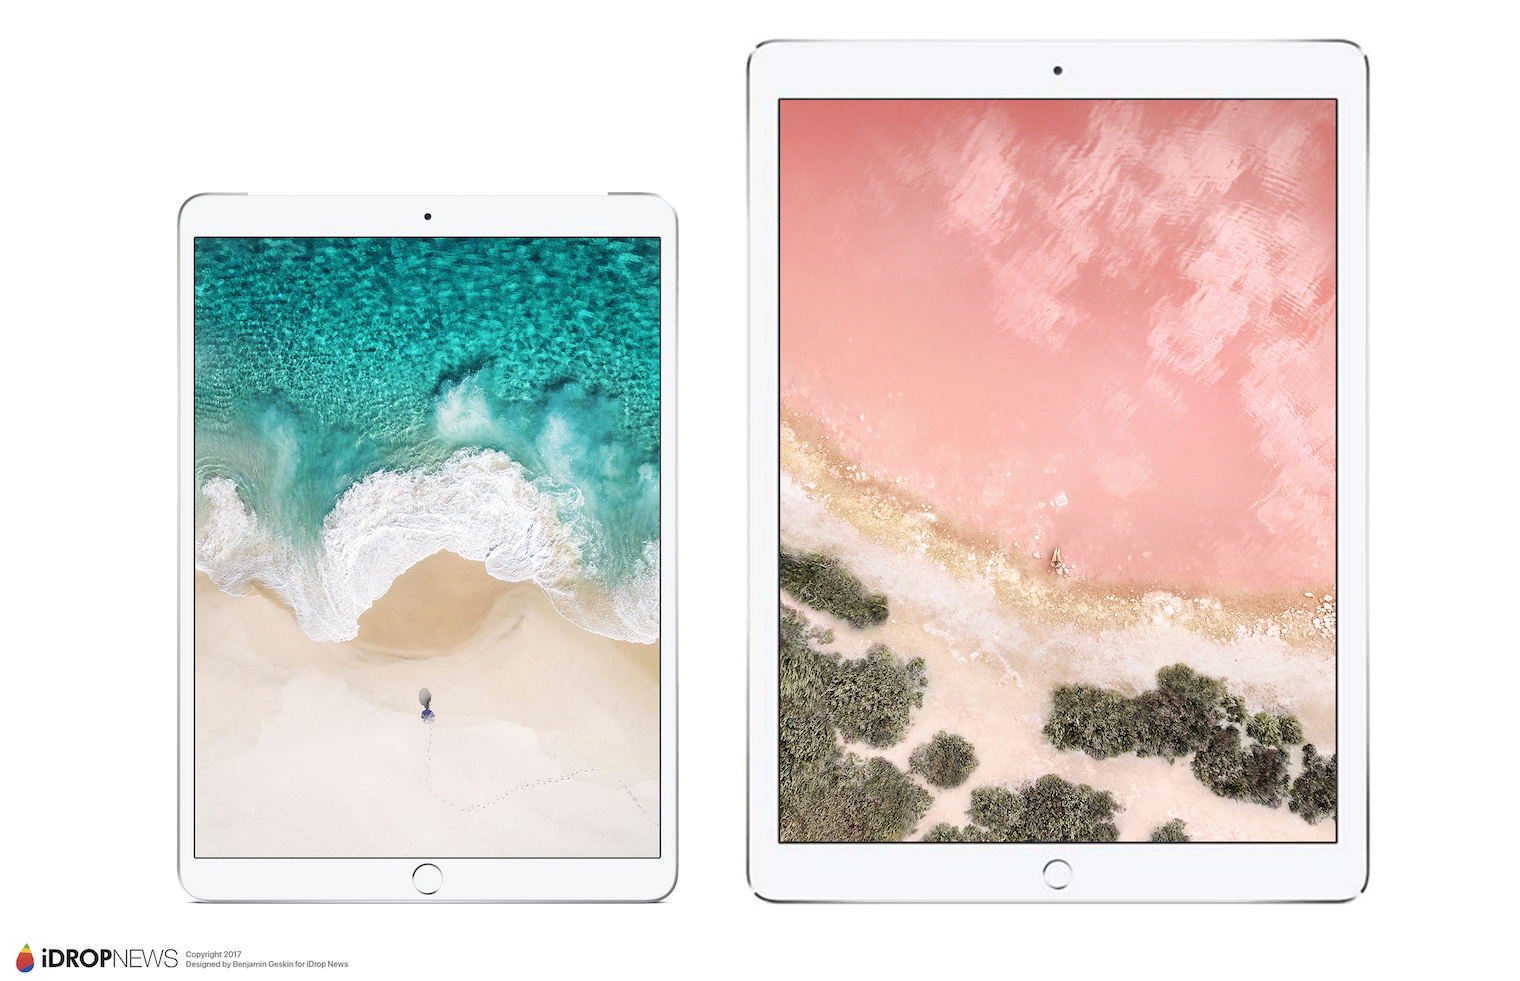 2017 iPad Pro Concept Image iDrop News